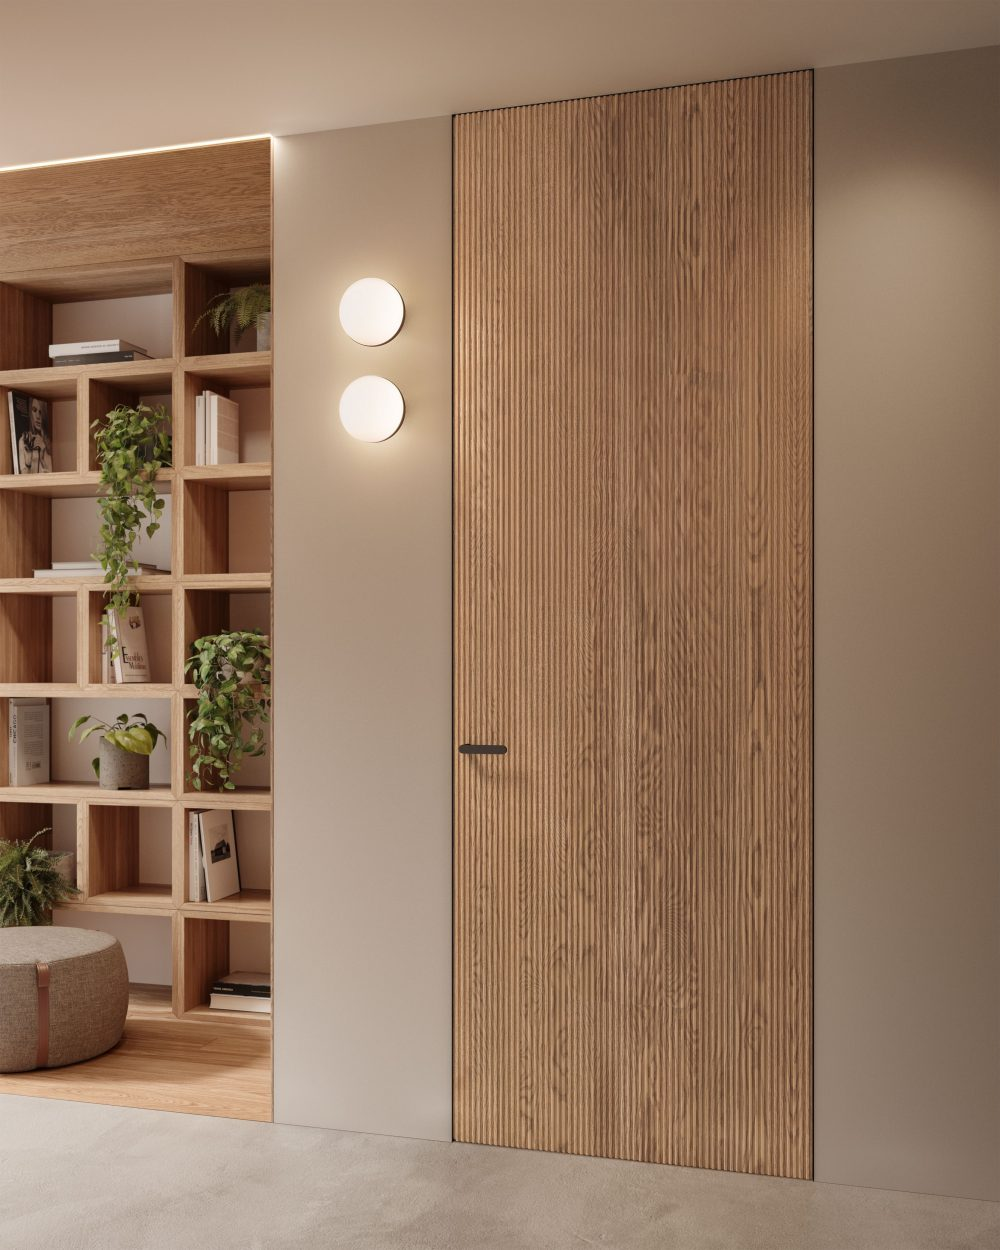 Porta filomuro in legno massiccio quadra garofoli - Garofoli